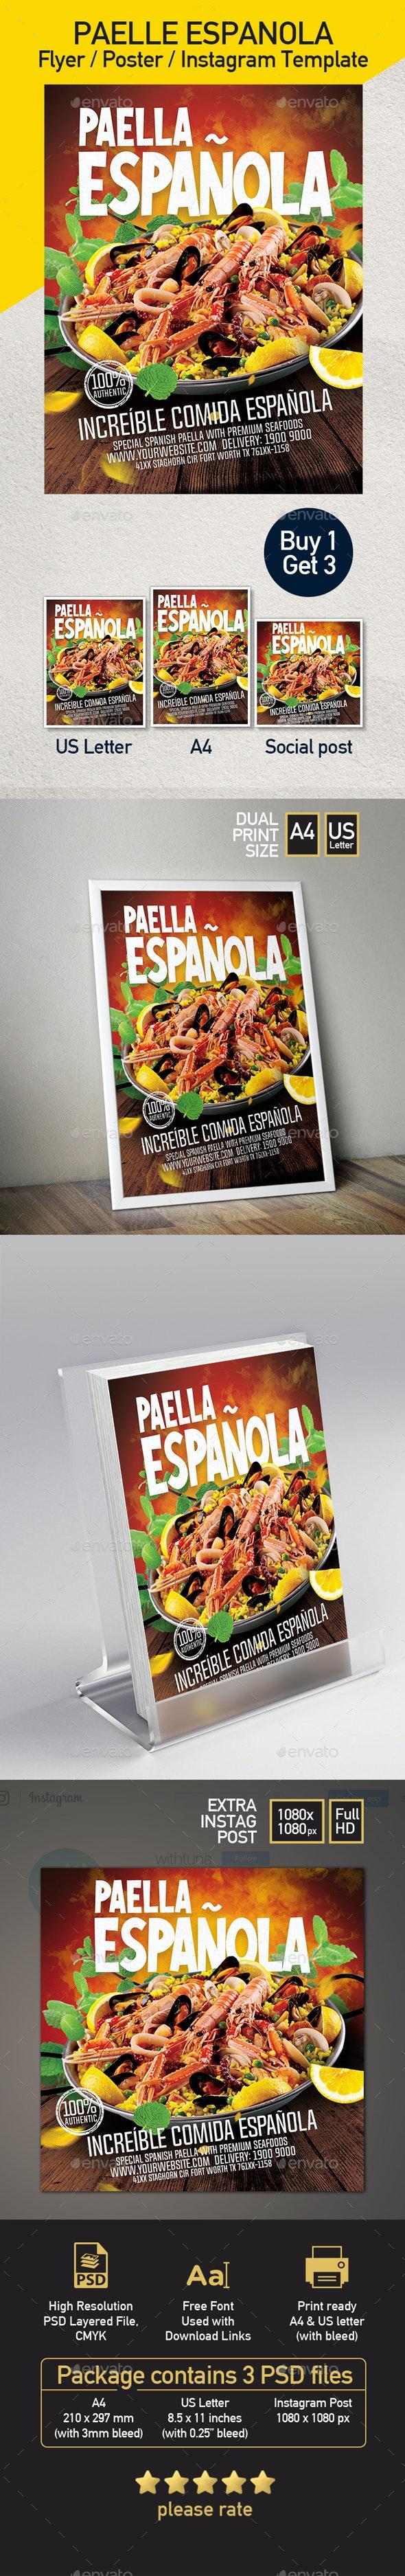 Paella - Spanish Food Flyer - Set of 3 Templates - Restaurant Flyers